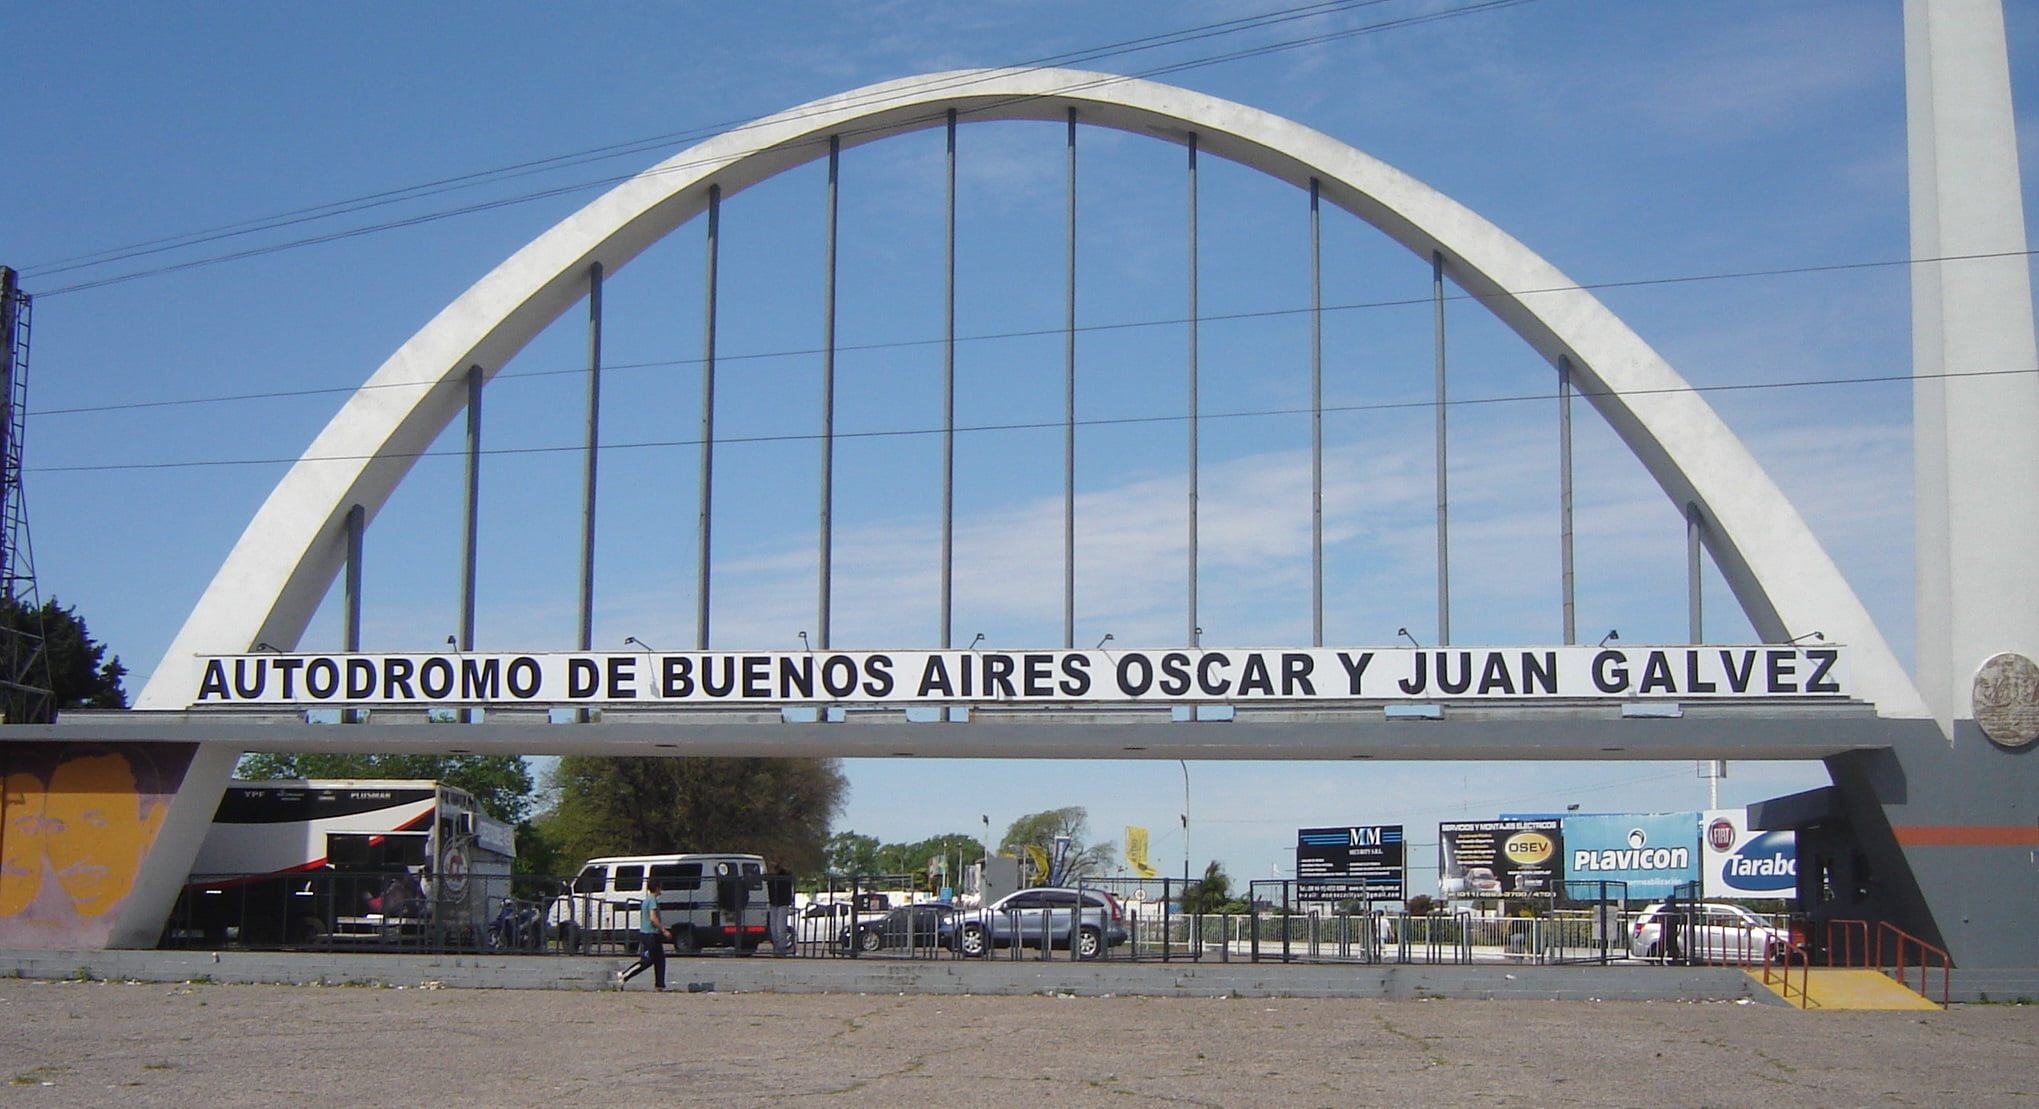 Circuito Galvez : Autodromo buenos aires juan y oscar galvez track redesign